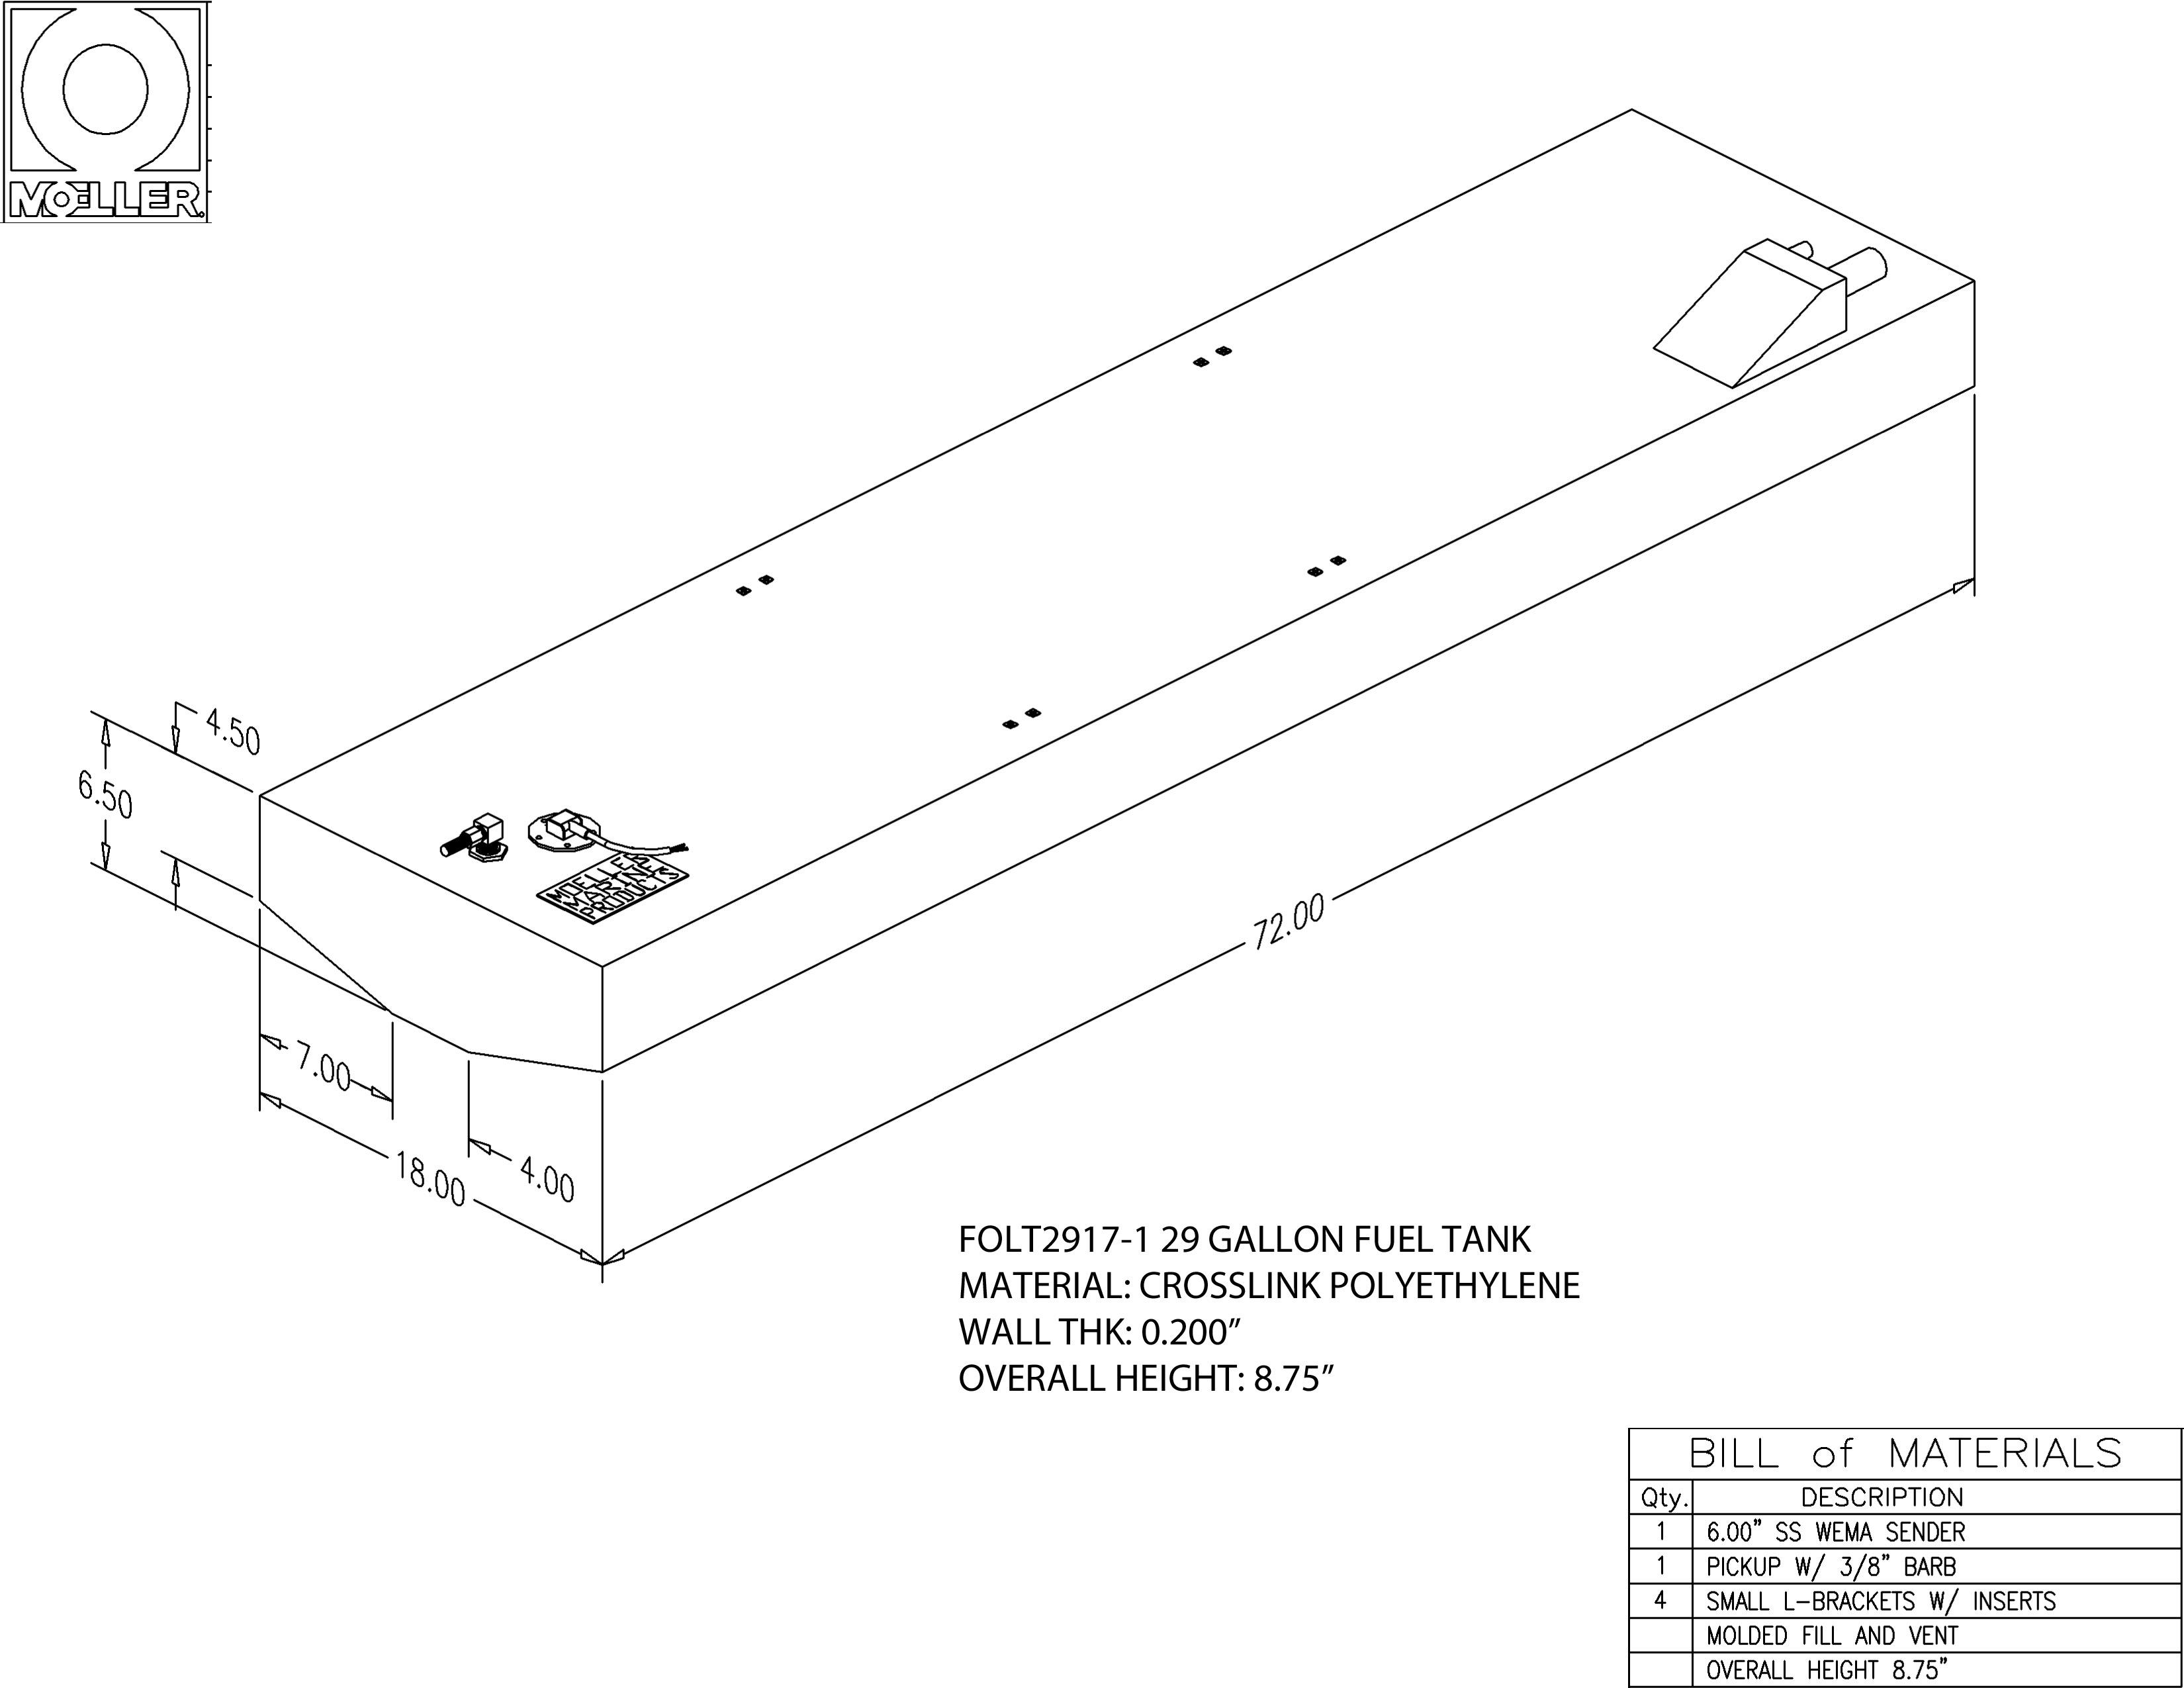 xs400 simplified wiring diagram auto electrical wiring diagram rh  semanticscholar org uk edu hardtobelieve me 1979